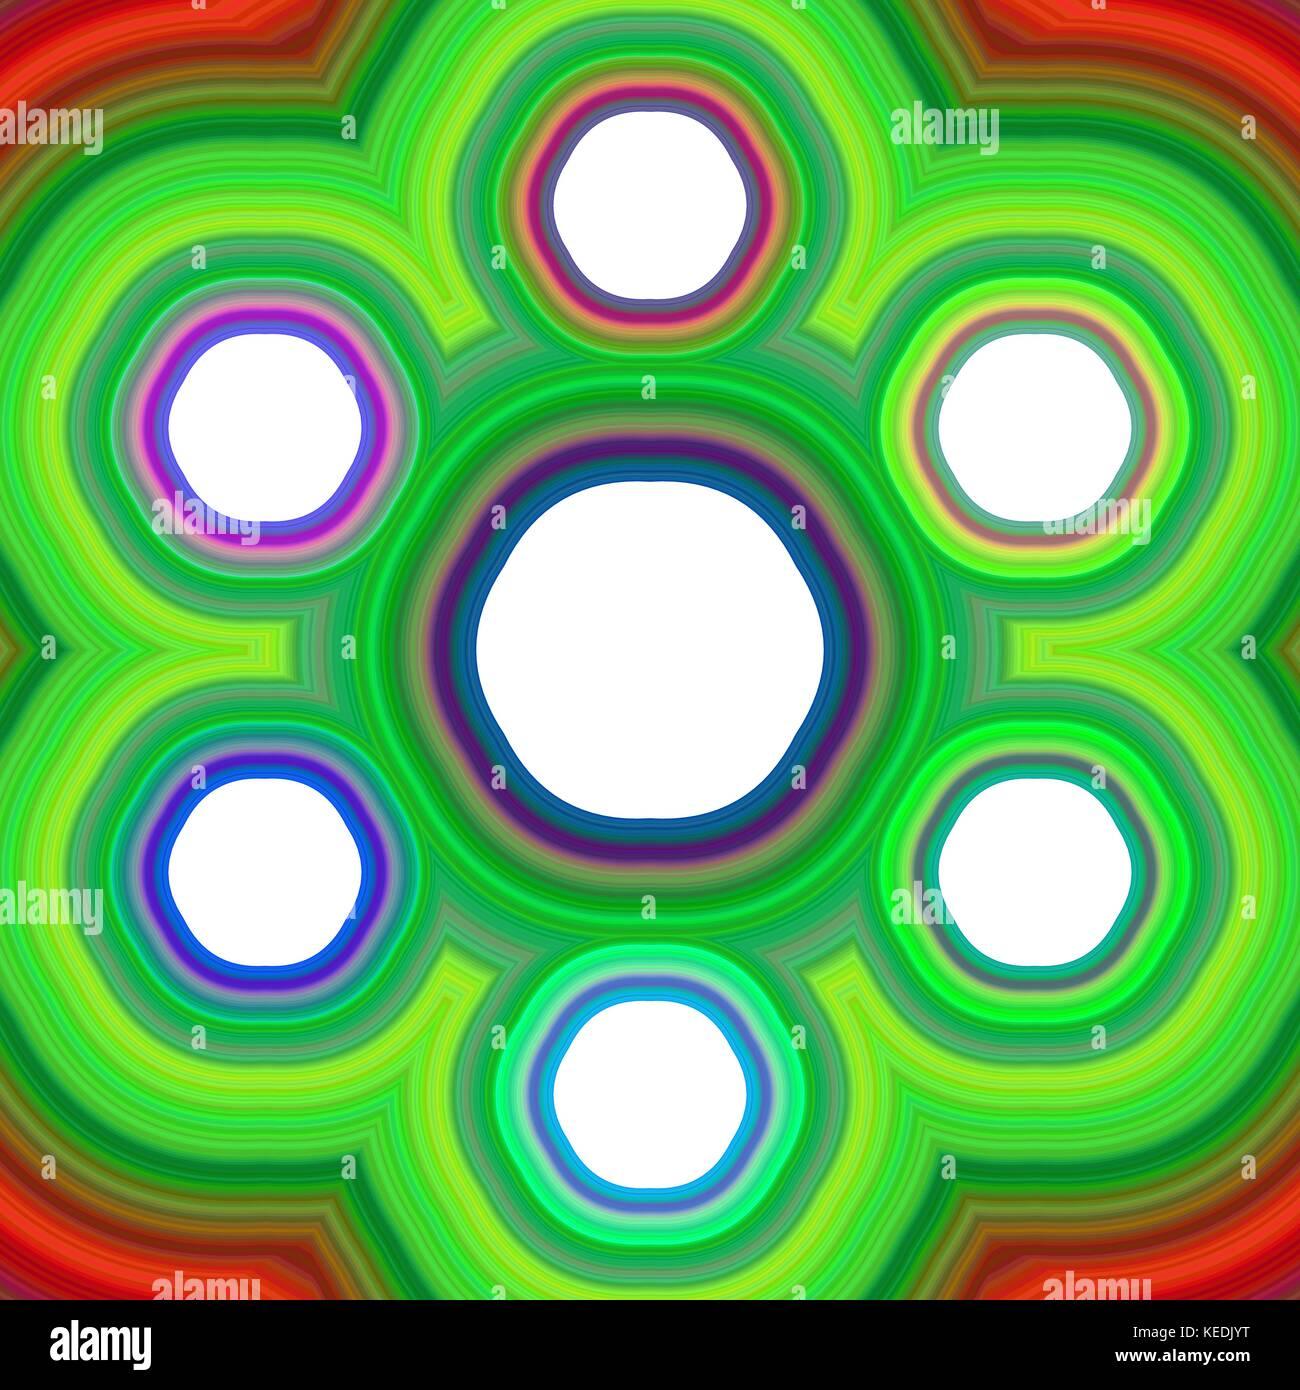 Hexagonal Symmetry Imágenes De Stock & Hexagonal Symmetry Fotos De ...